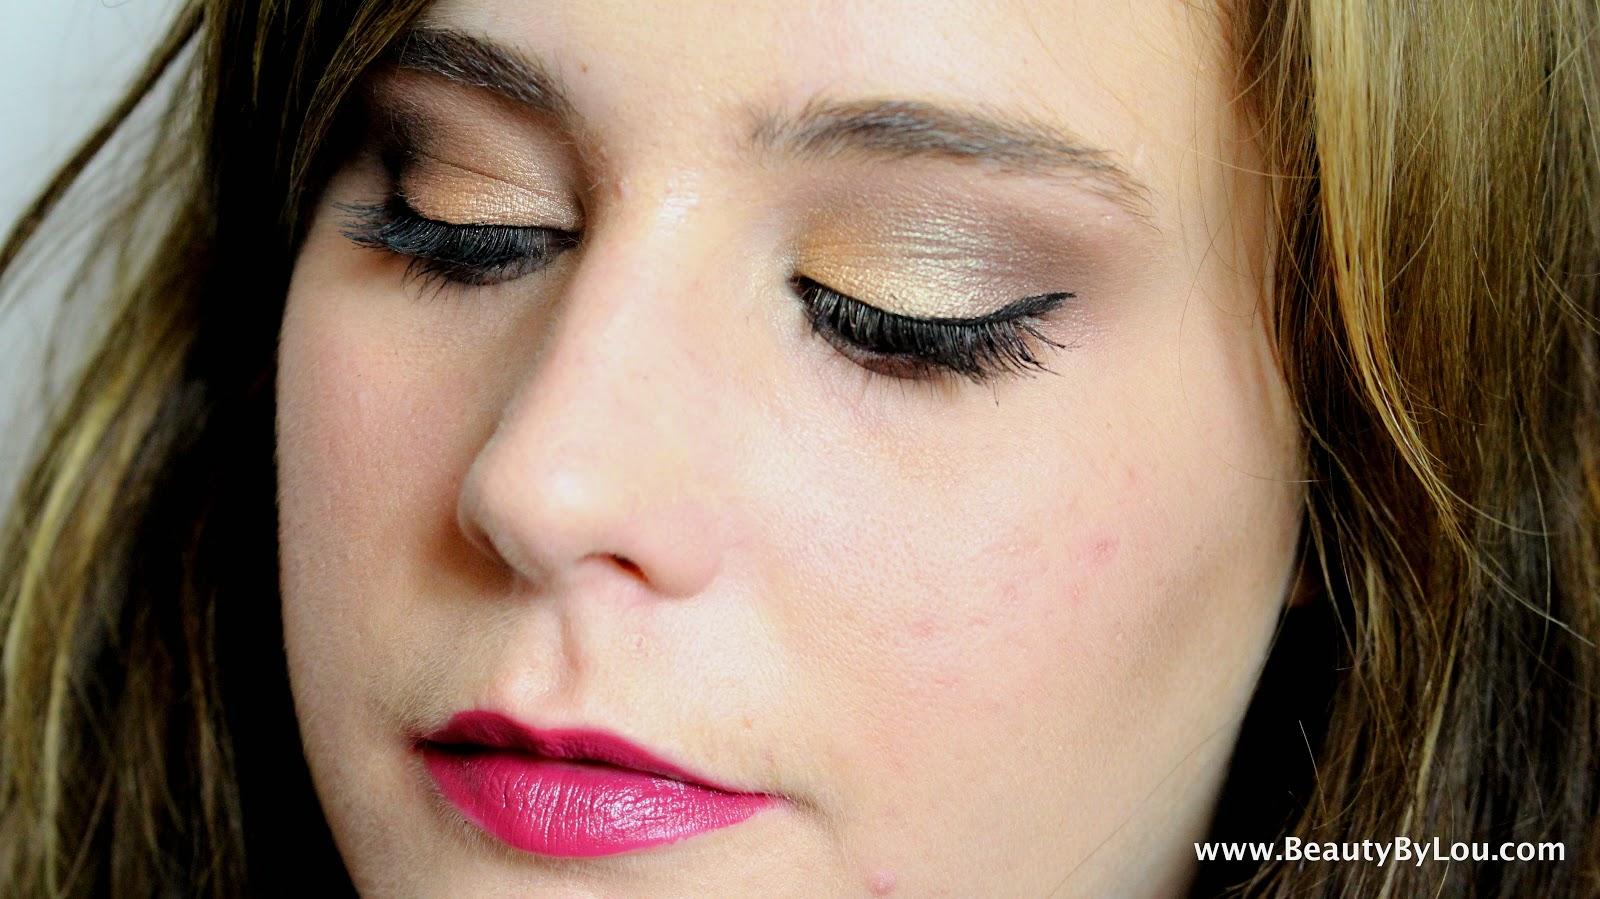 http://www.beautybylou.com/2014/10/Tutoriel-dore-yeux-palette-Tarte-Rainforest-After-Dark.html